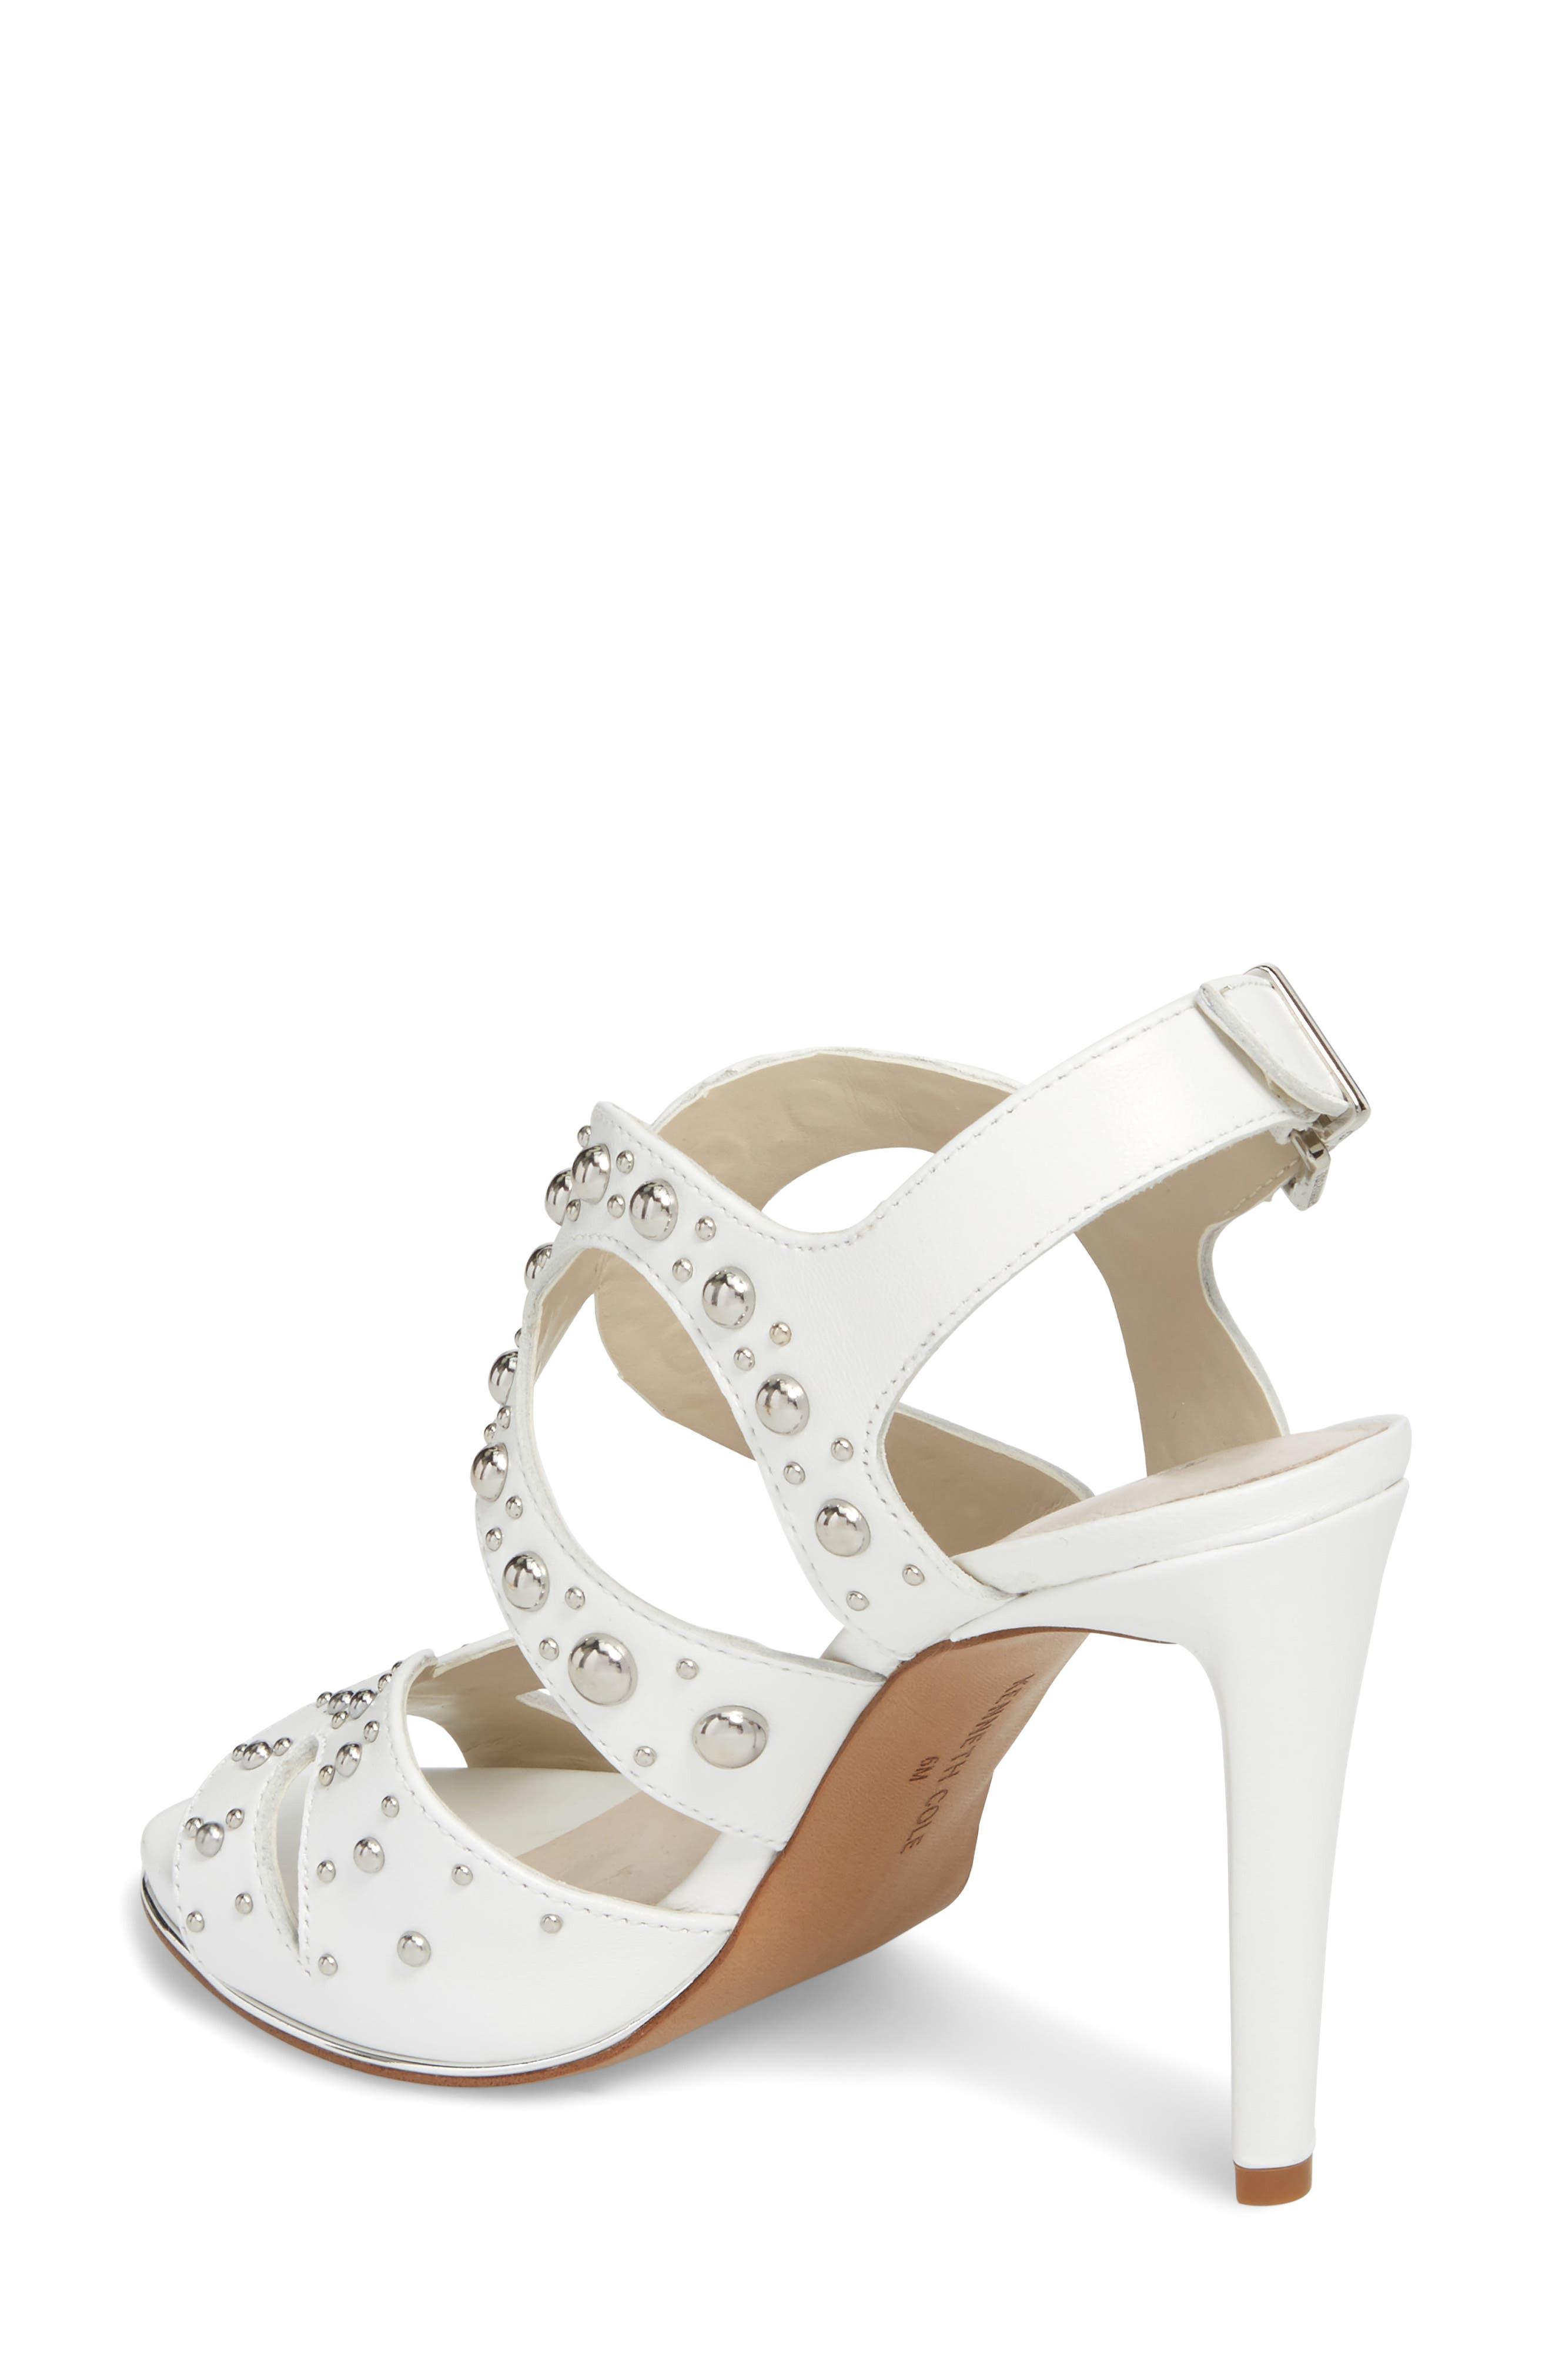 Baldwin Stud Sandal,                             Alternate thumbnail 2, color,                             White Leather